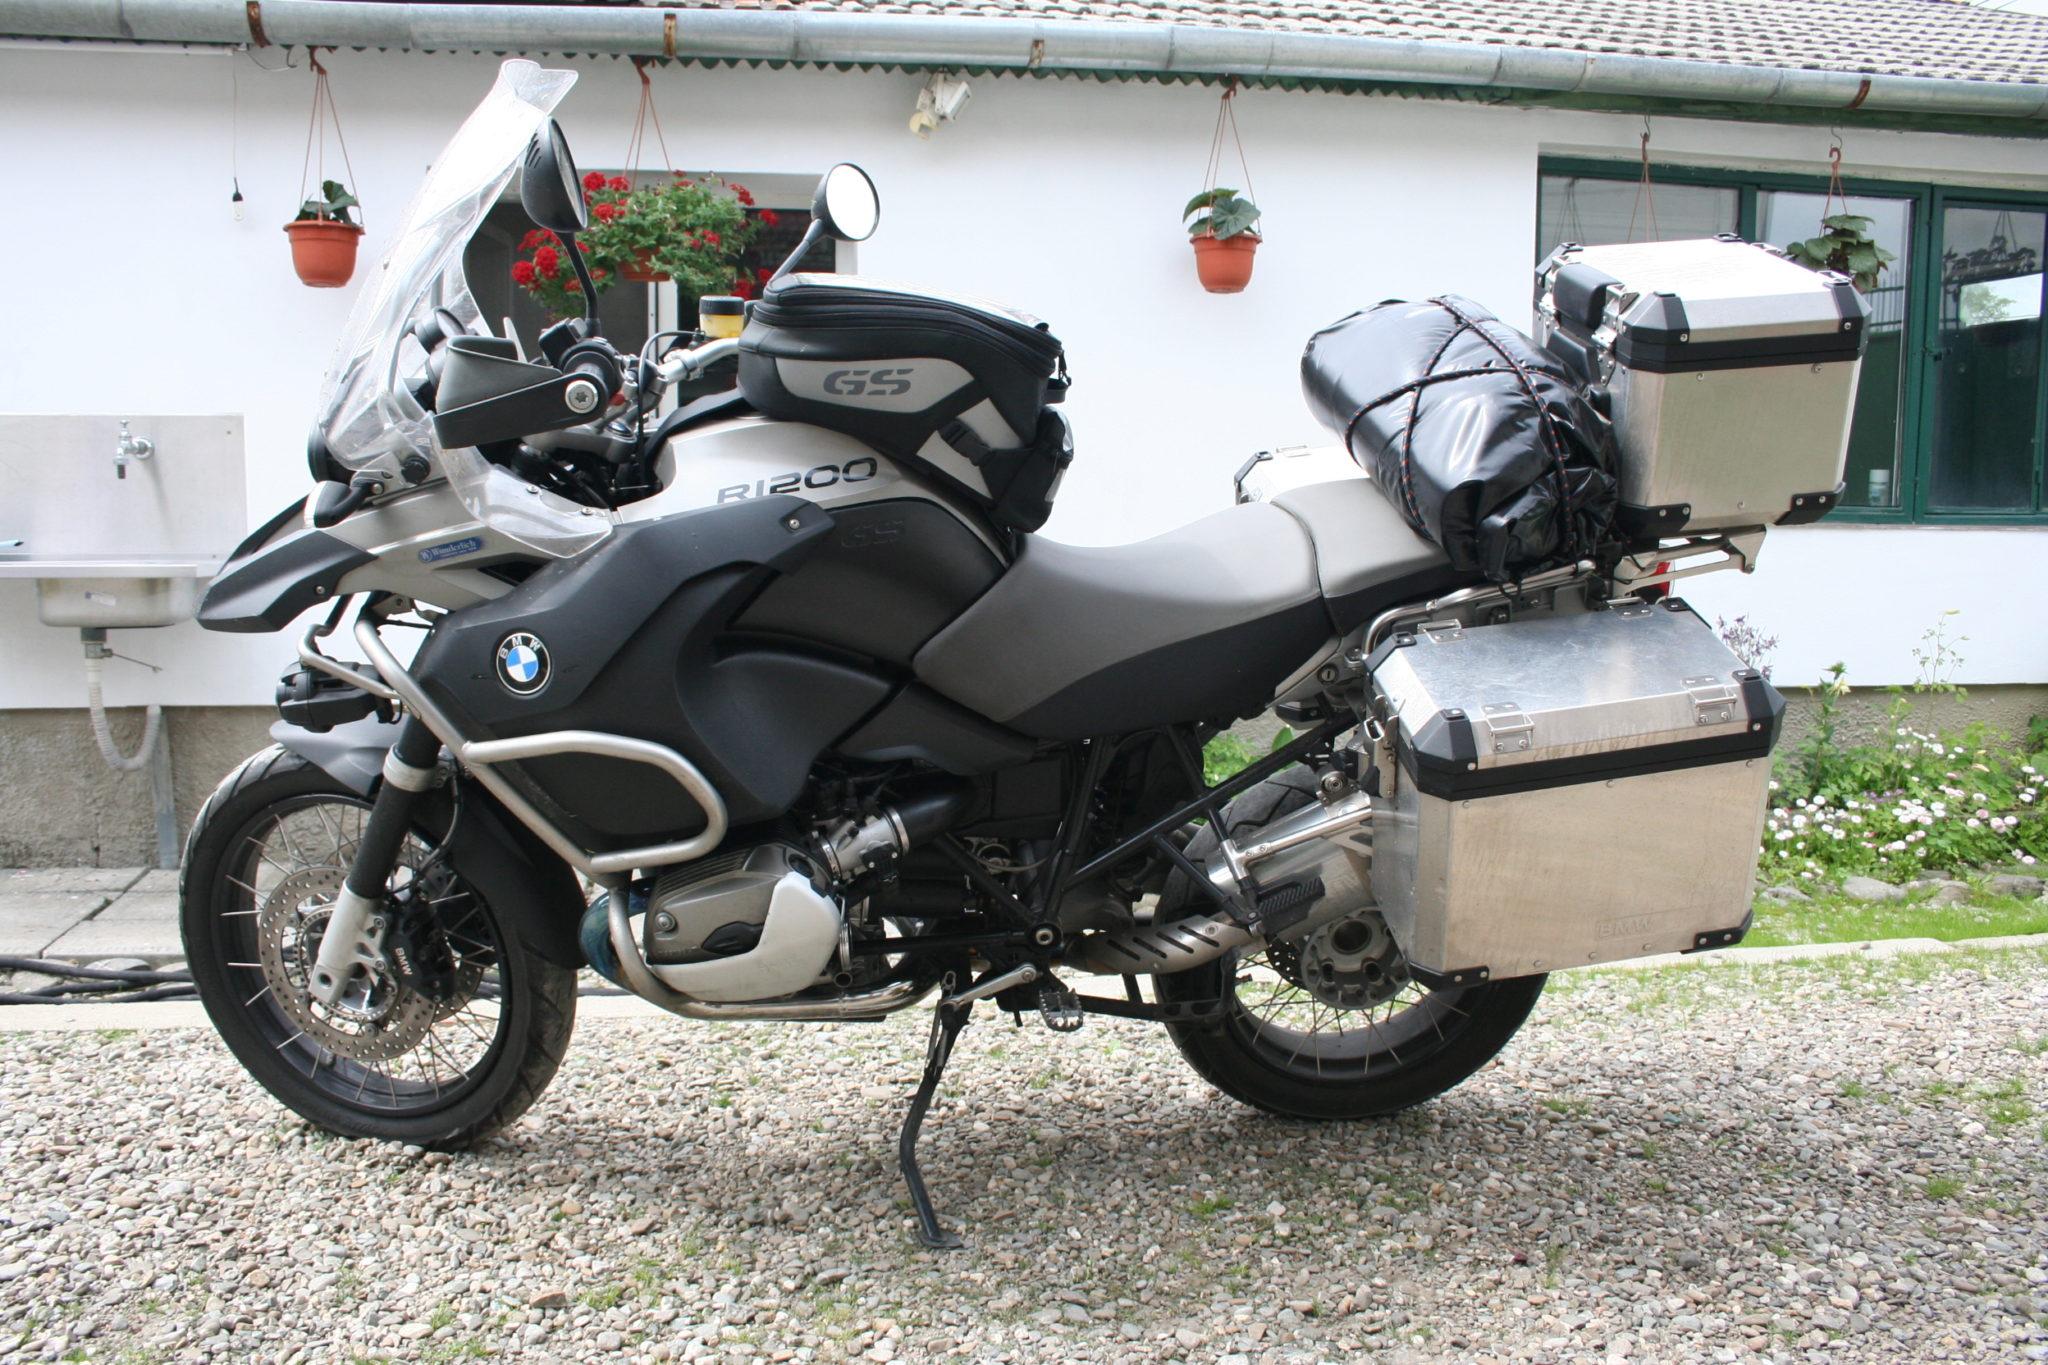 Nicu – BMW R1200GS Adventure 2